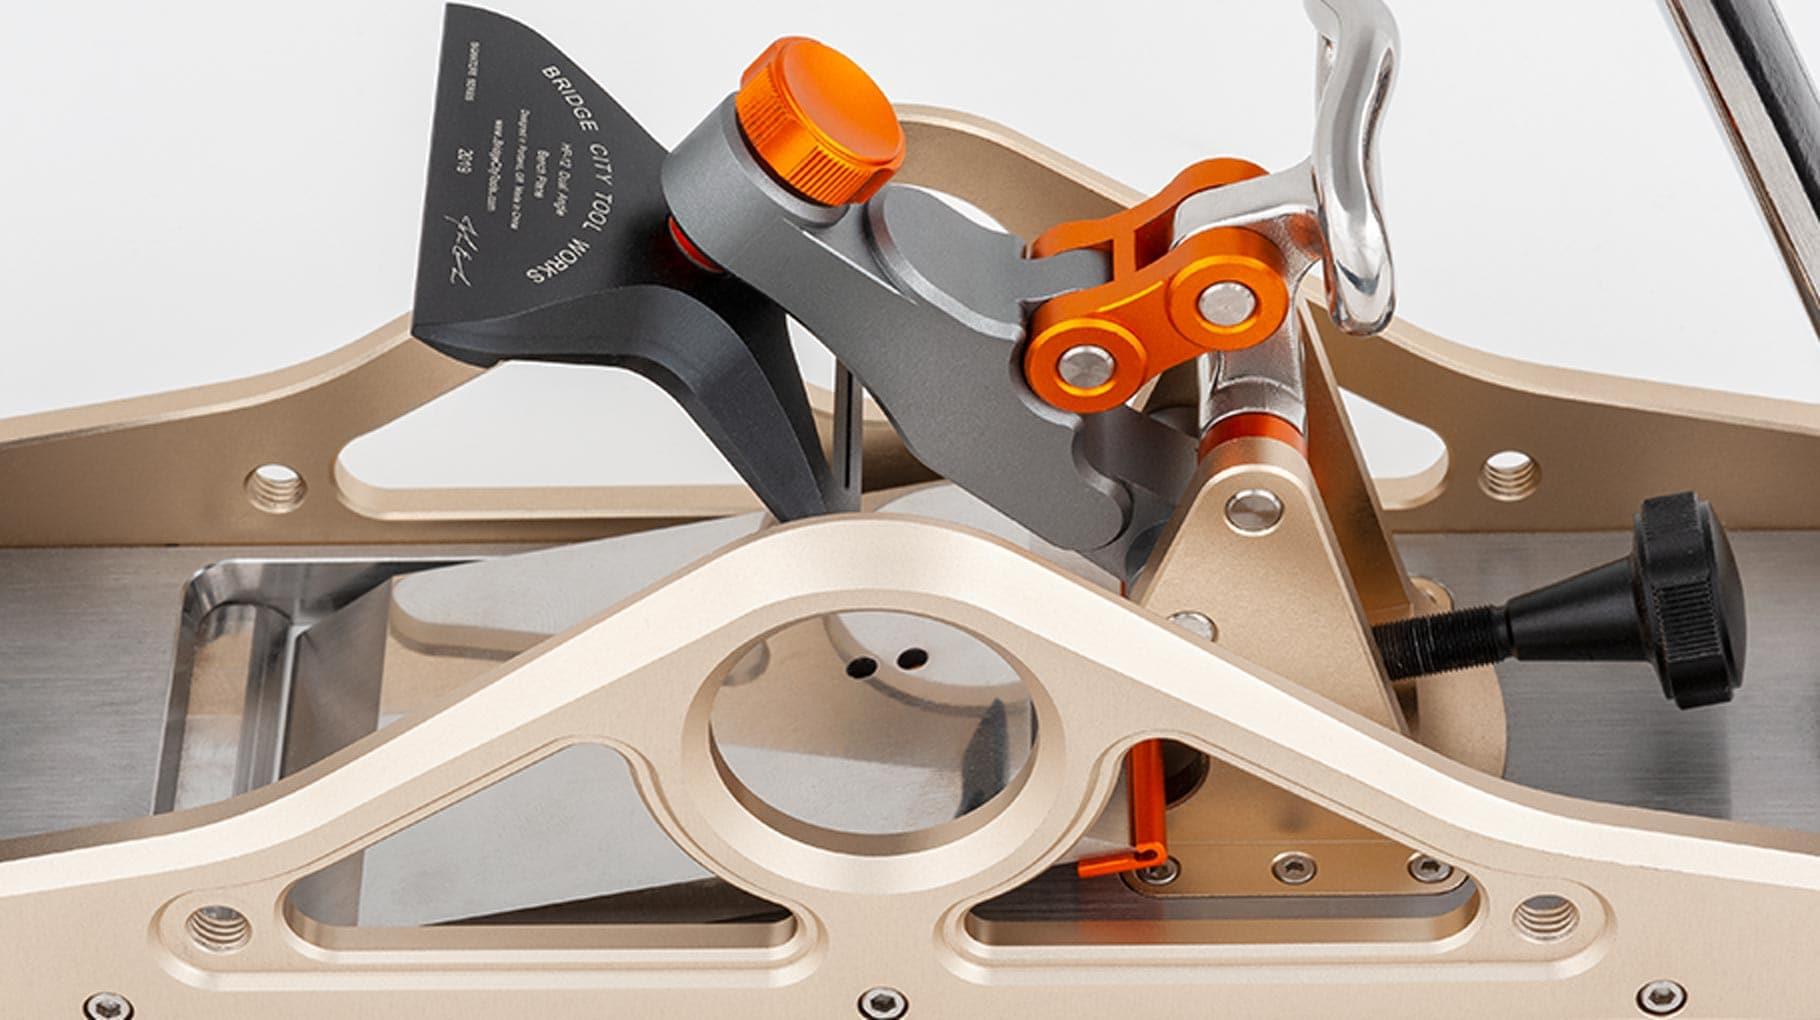 Unique blade locking mechanism